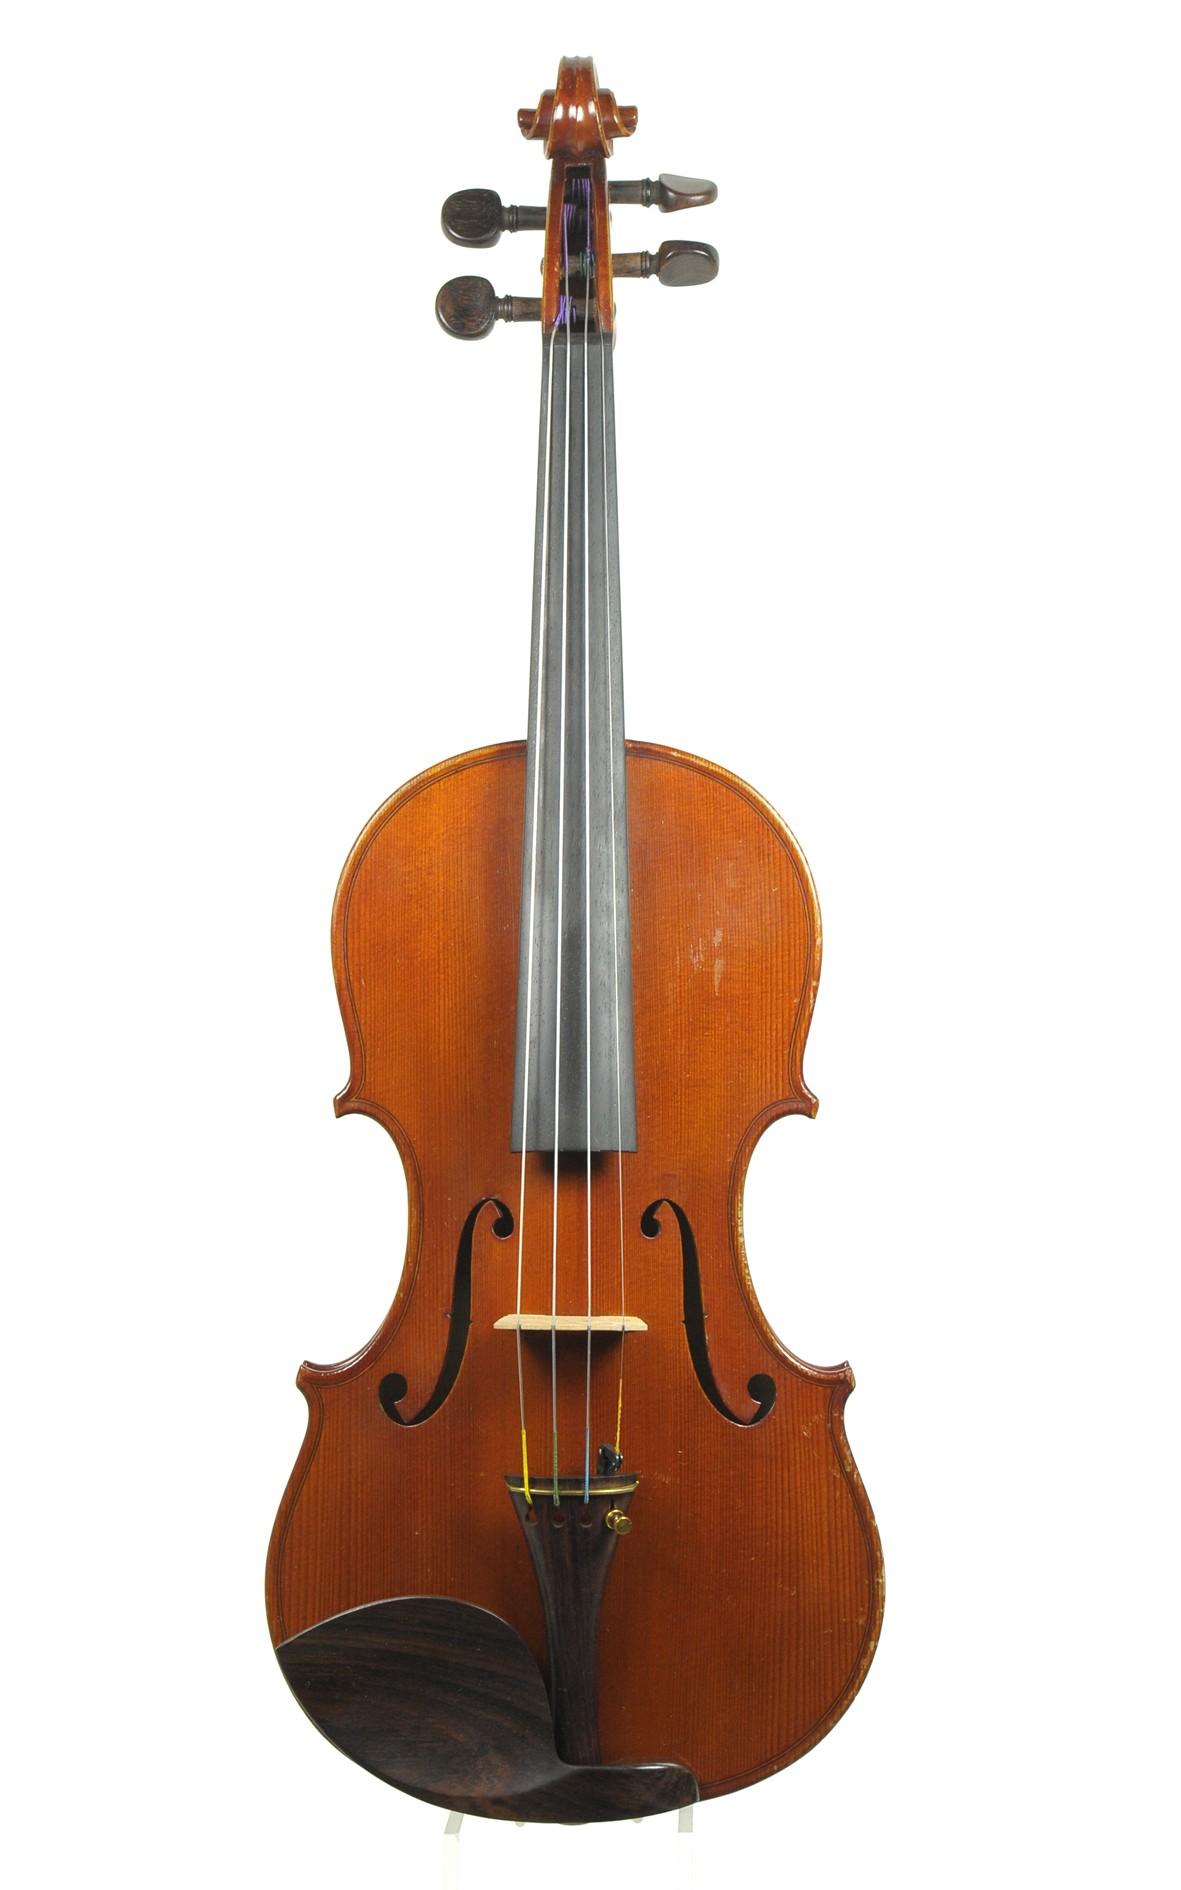 French master violin, Jean Striebig violin No 597 Mirecourt - table